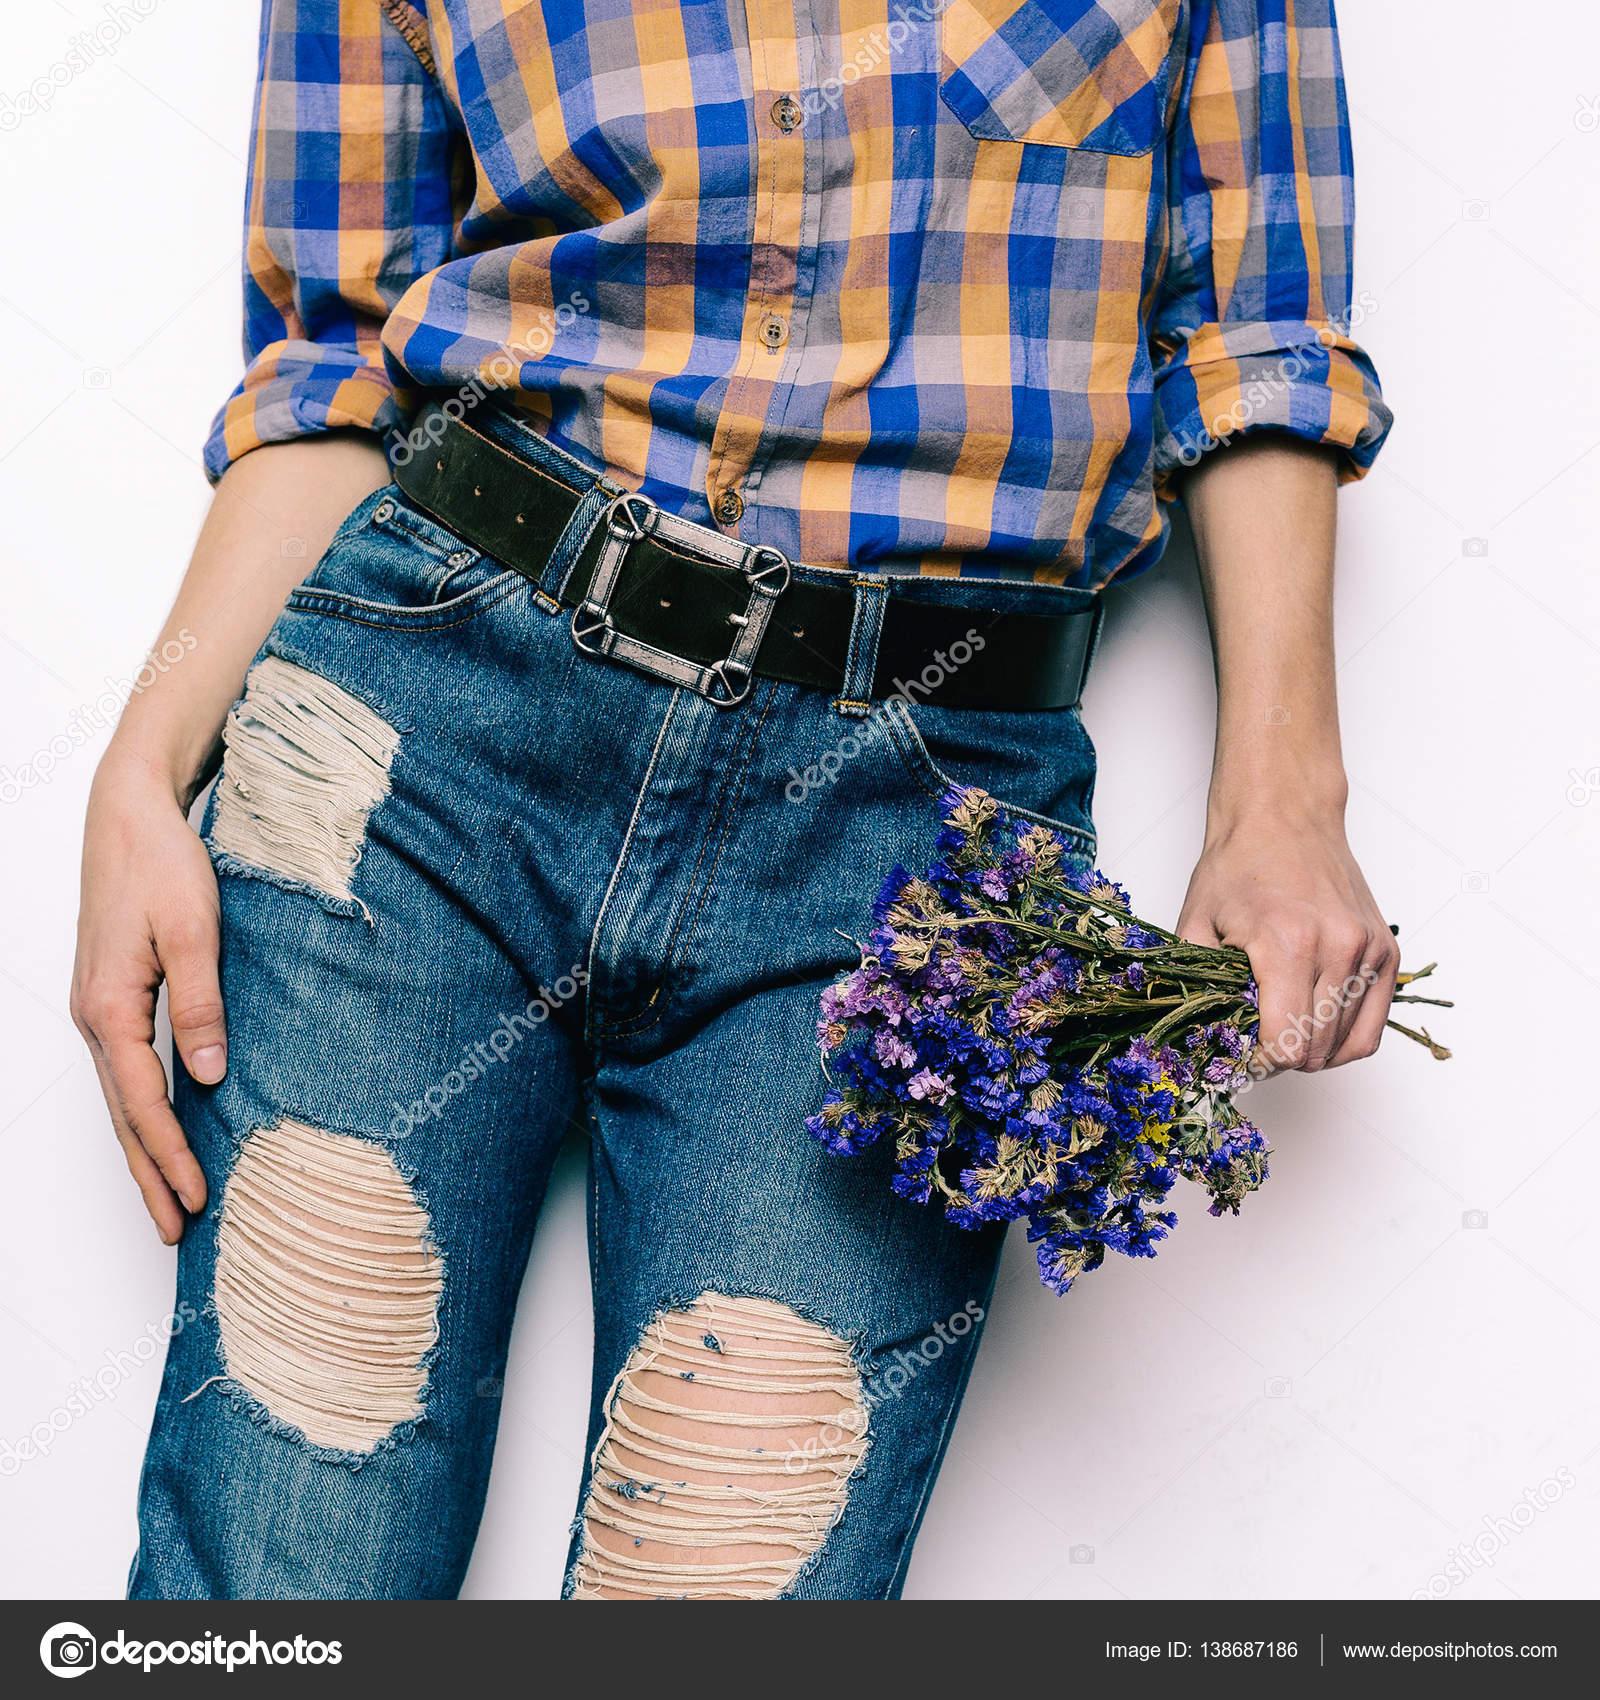 e58b027fcb3 Country Girl Summer fashion style. Accessories. classic blue jea– stock  image